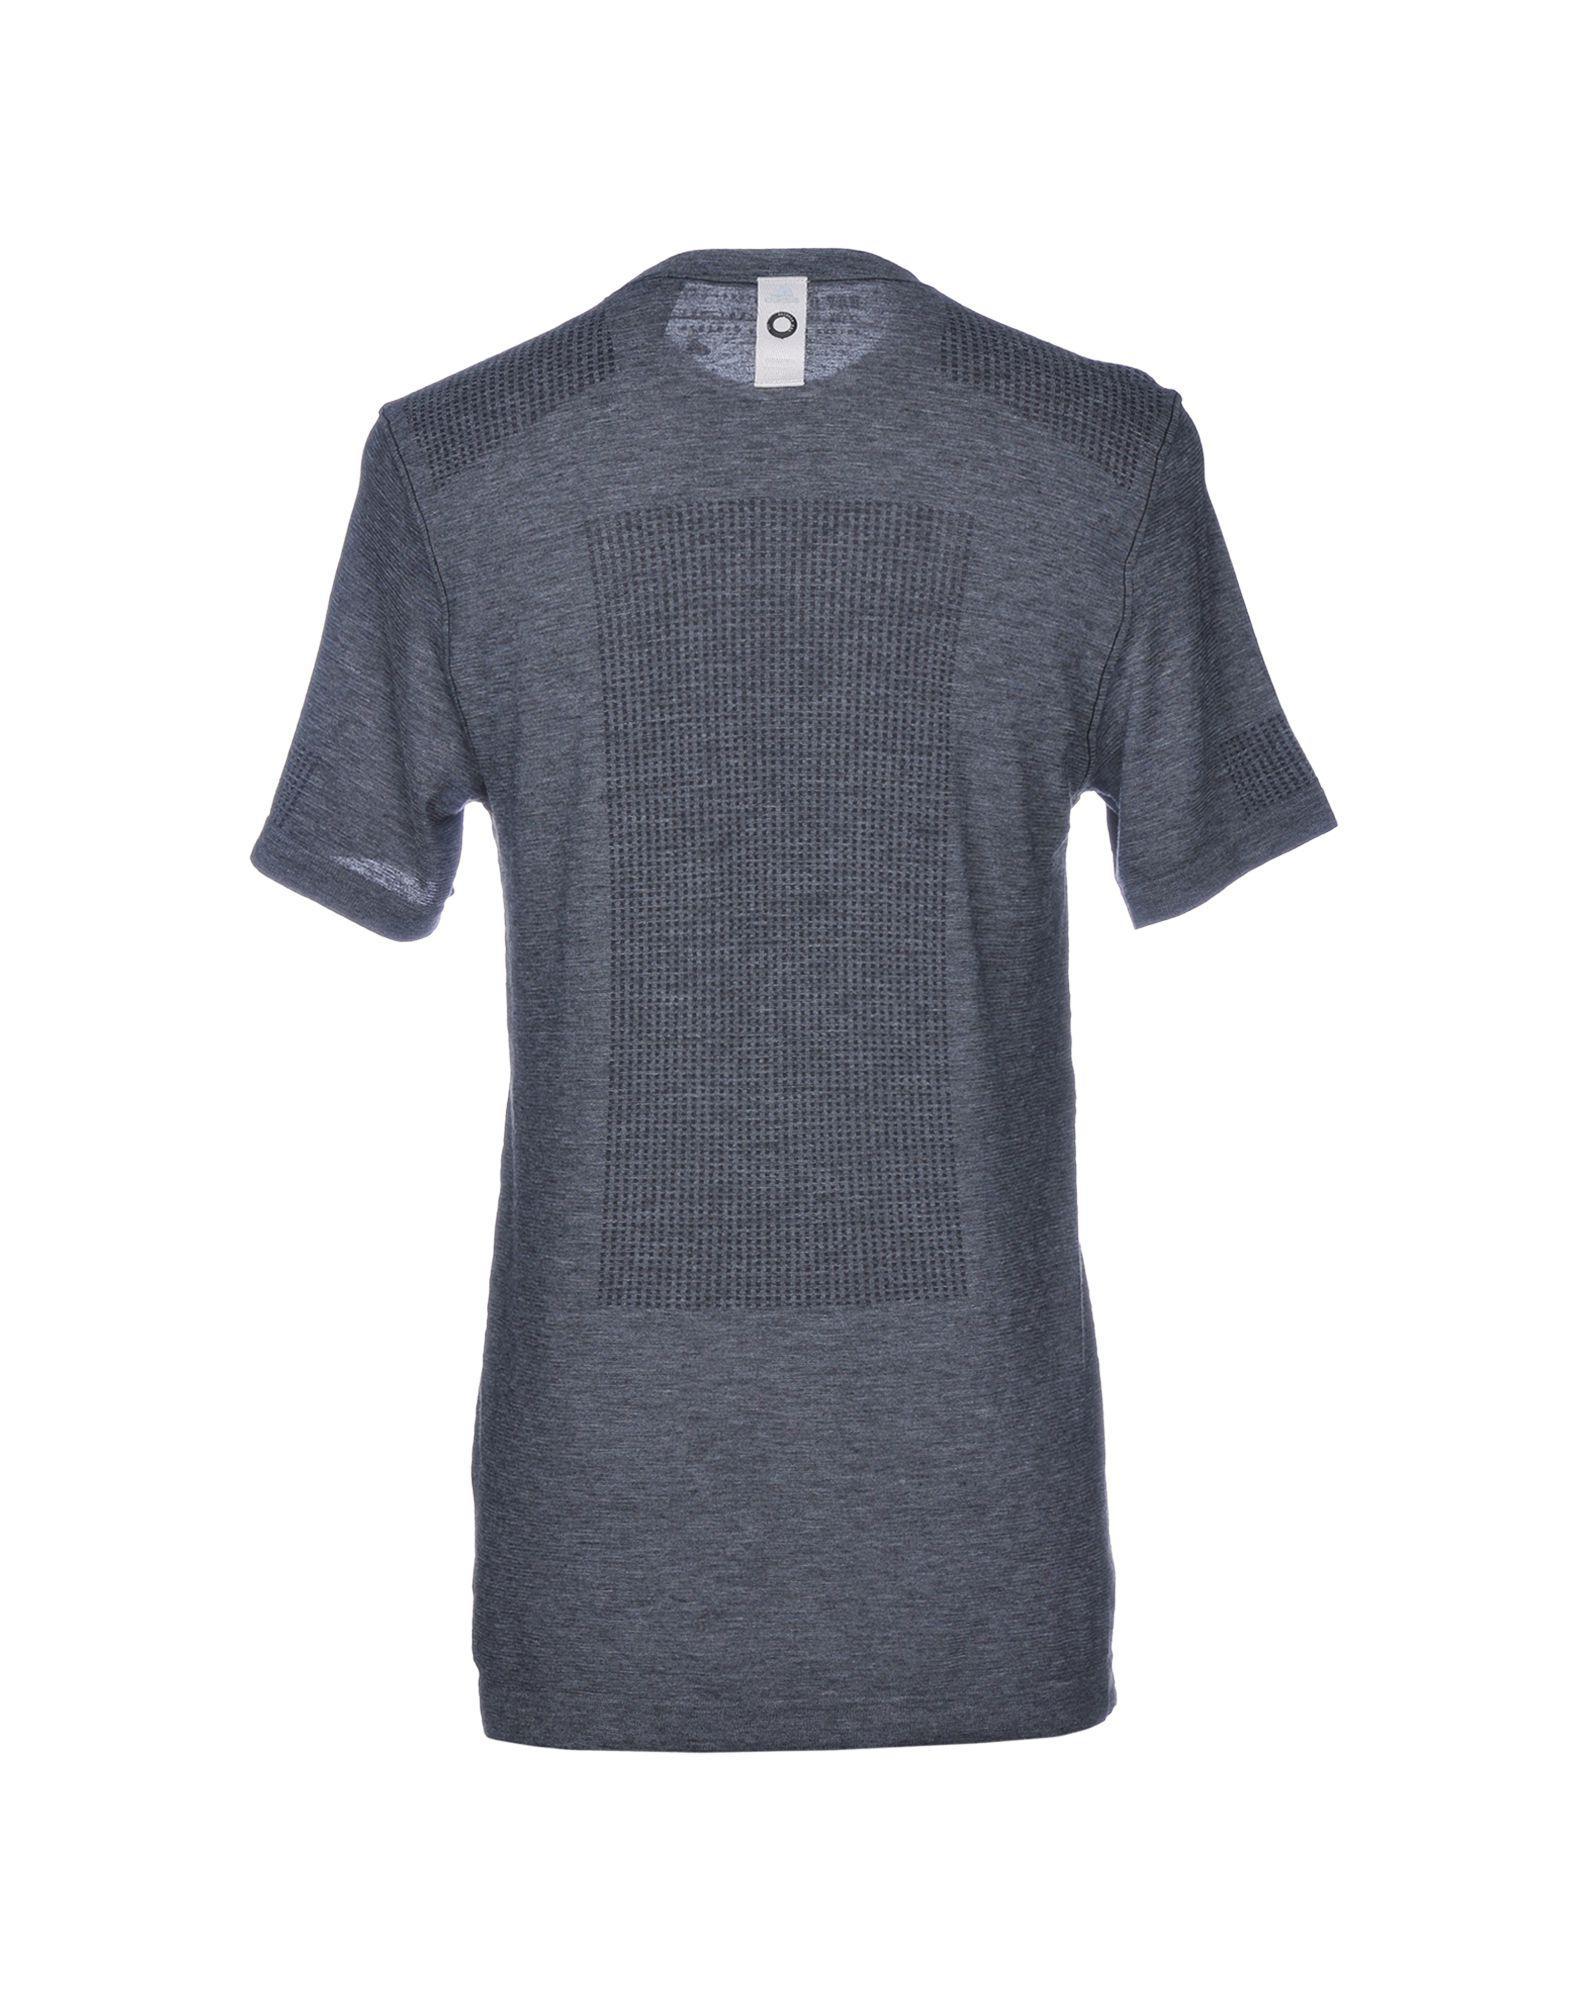 5dc0bdd4 adidas Jumper in Gray for Men - Lyst